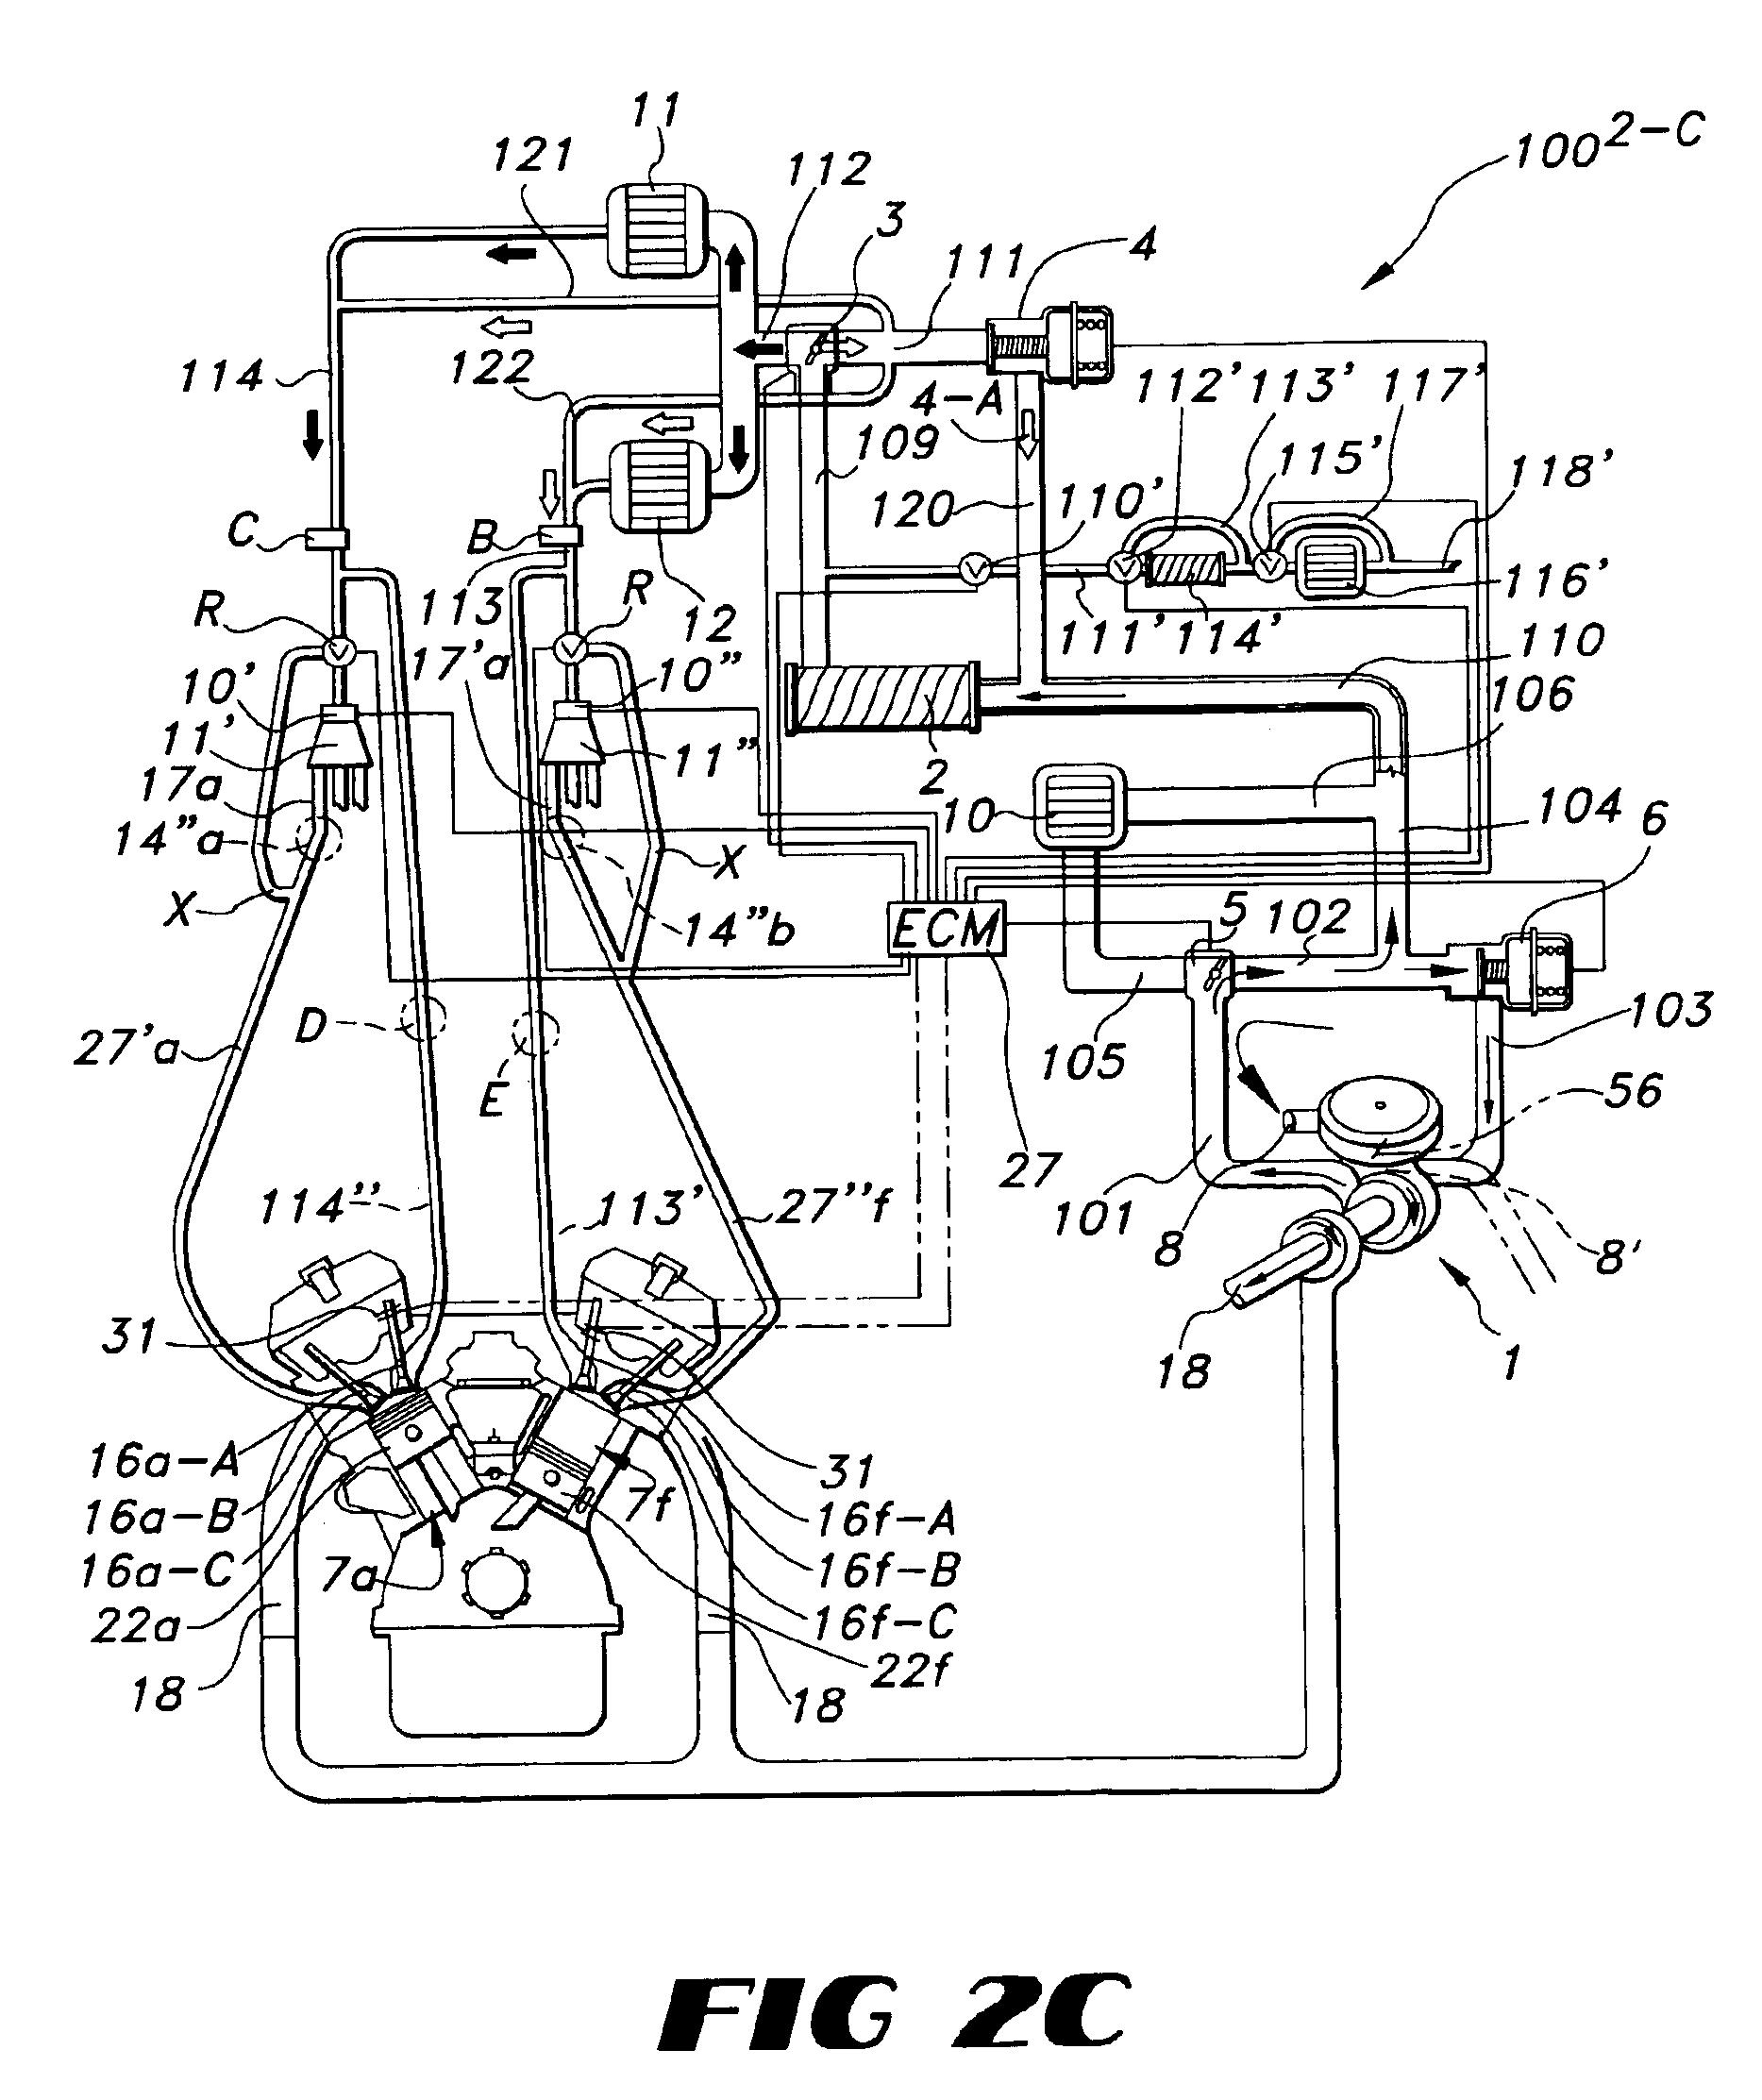 heywood internal combustion engine fundamentals solutions manual